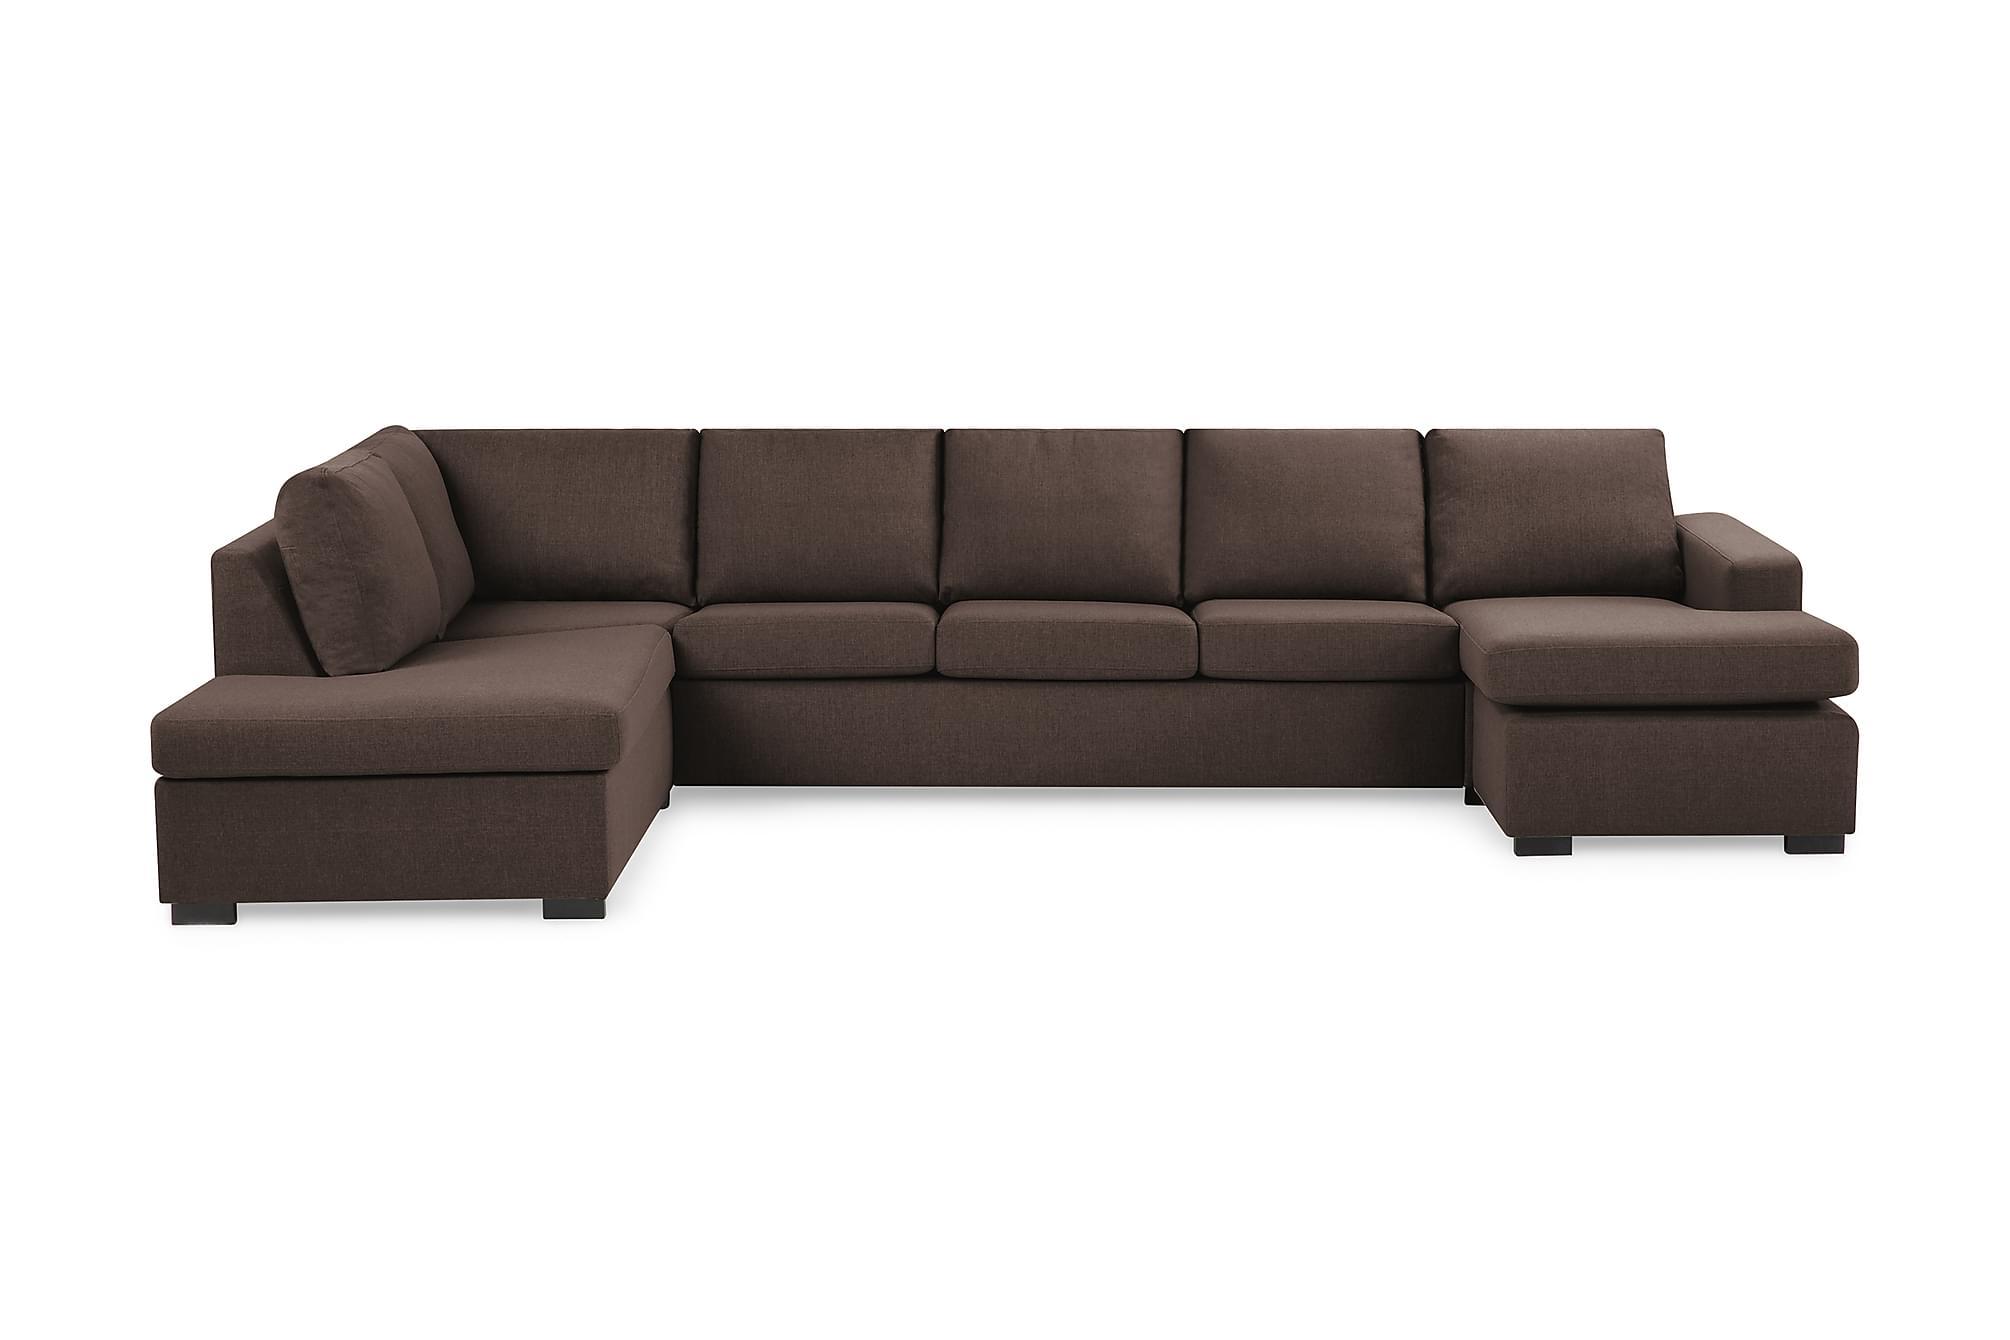 crazy u sofa xxl venstre brun. Black Bedroom Furniture Sets. Home Design Ideas